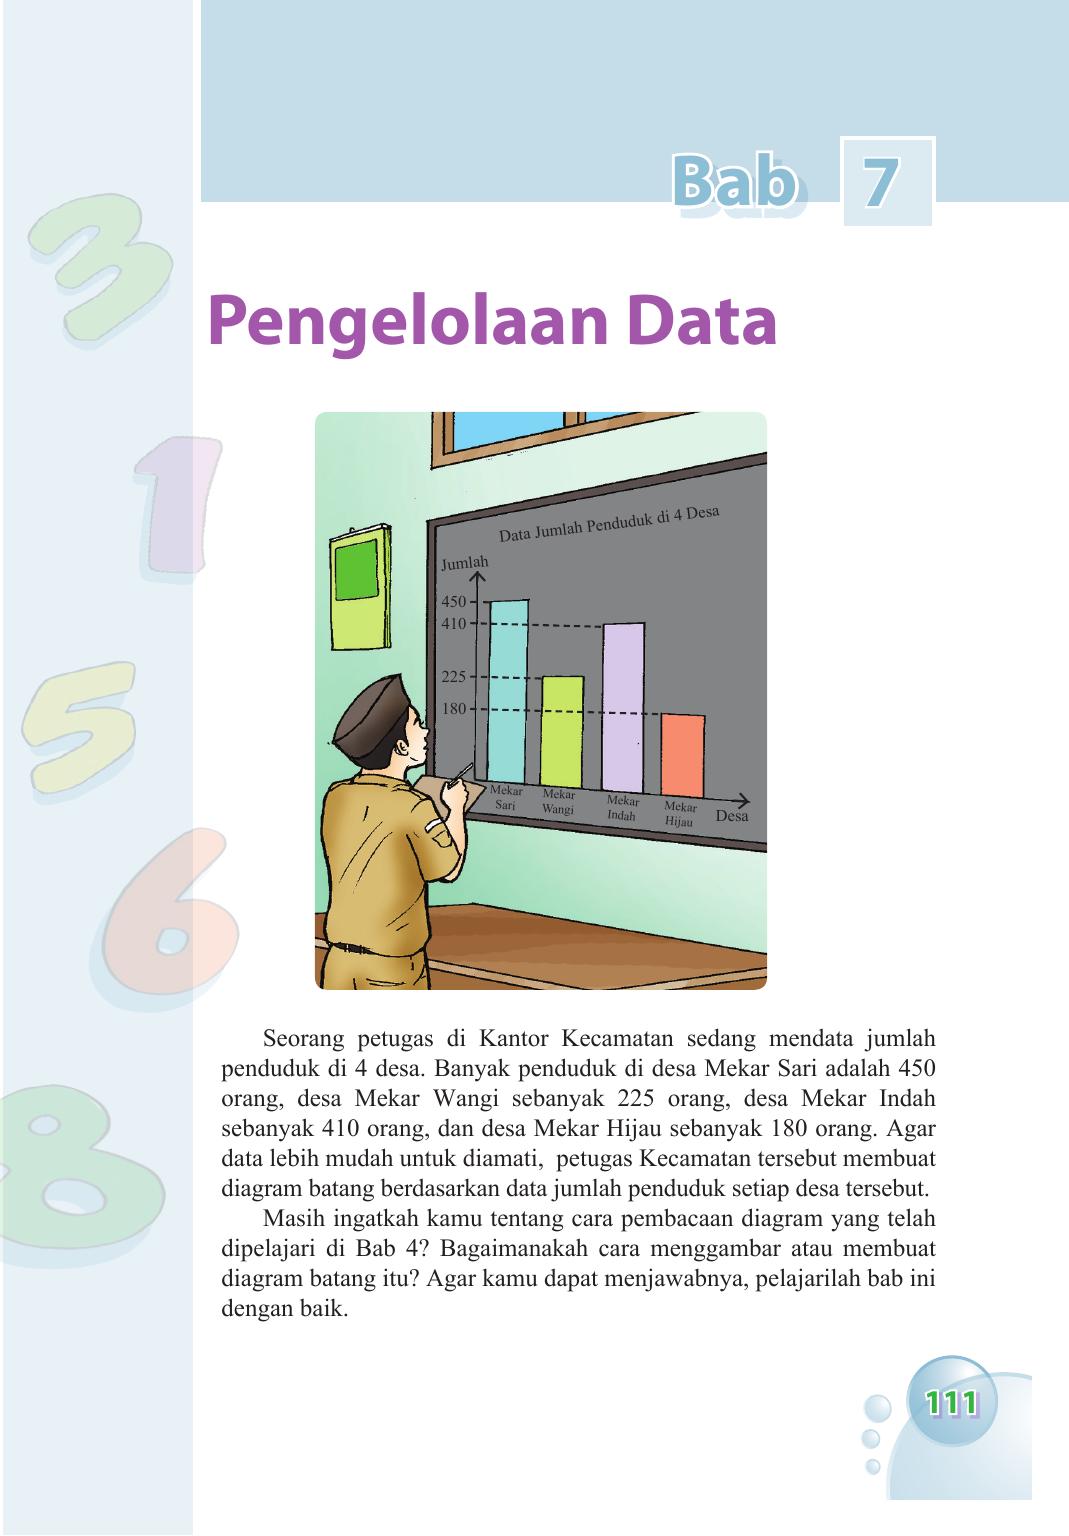 Bab 7 Pengelolaan Data